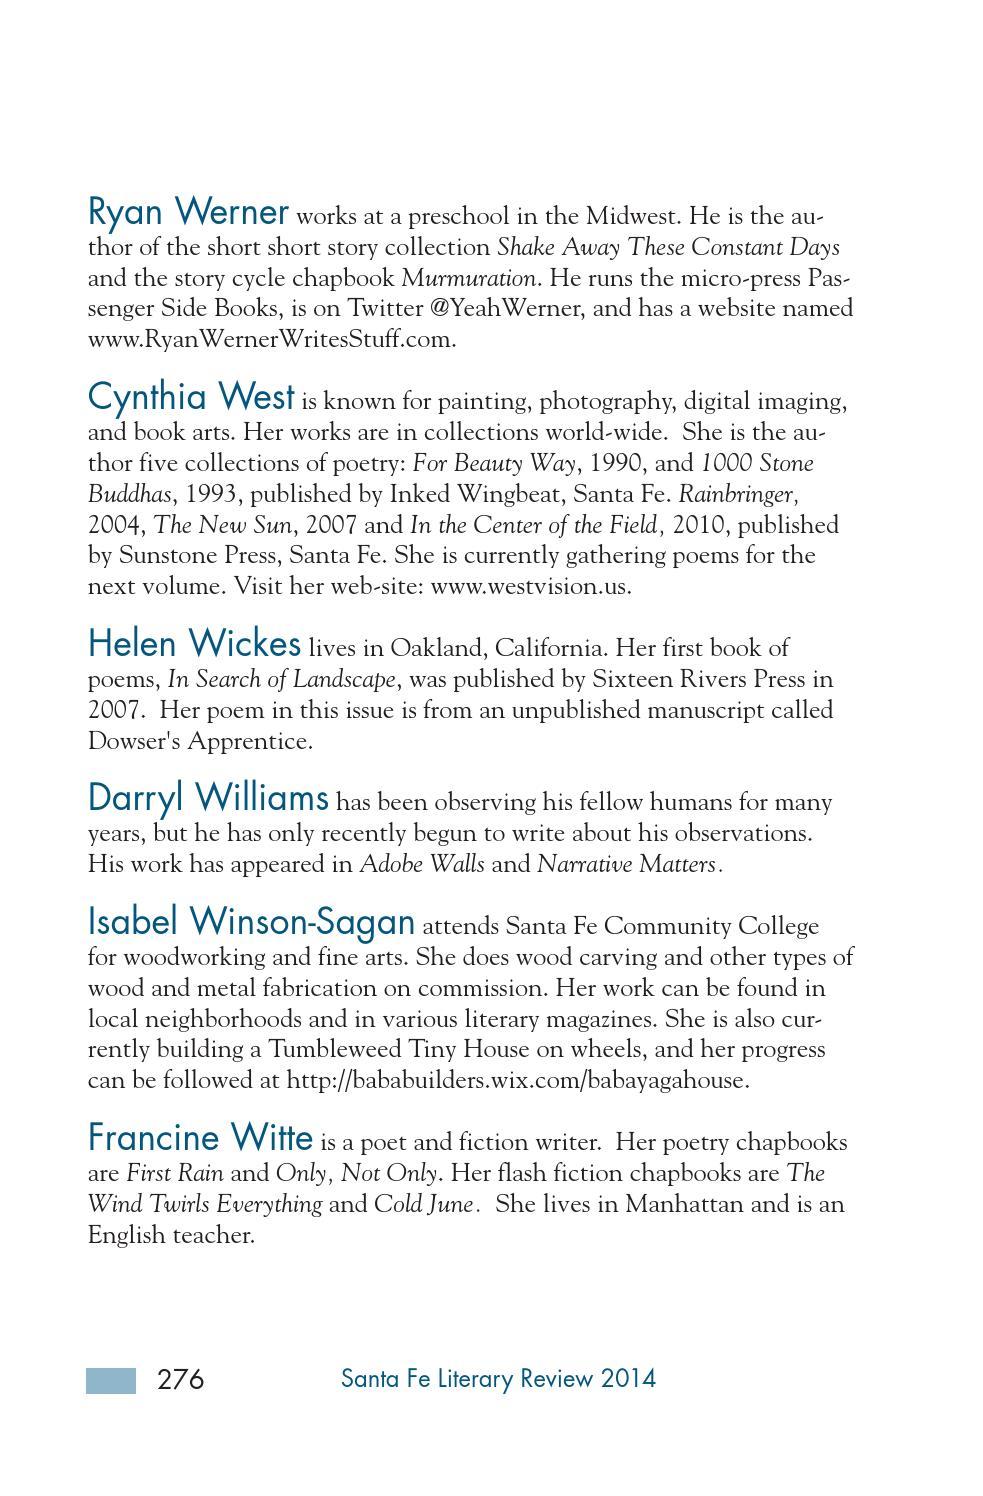 Santa Fe Literary Review 2014 by Santa Fe Community College